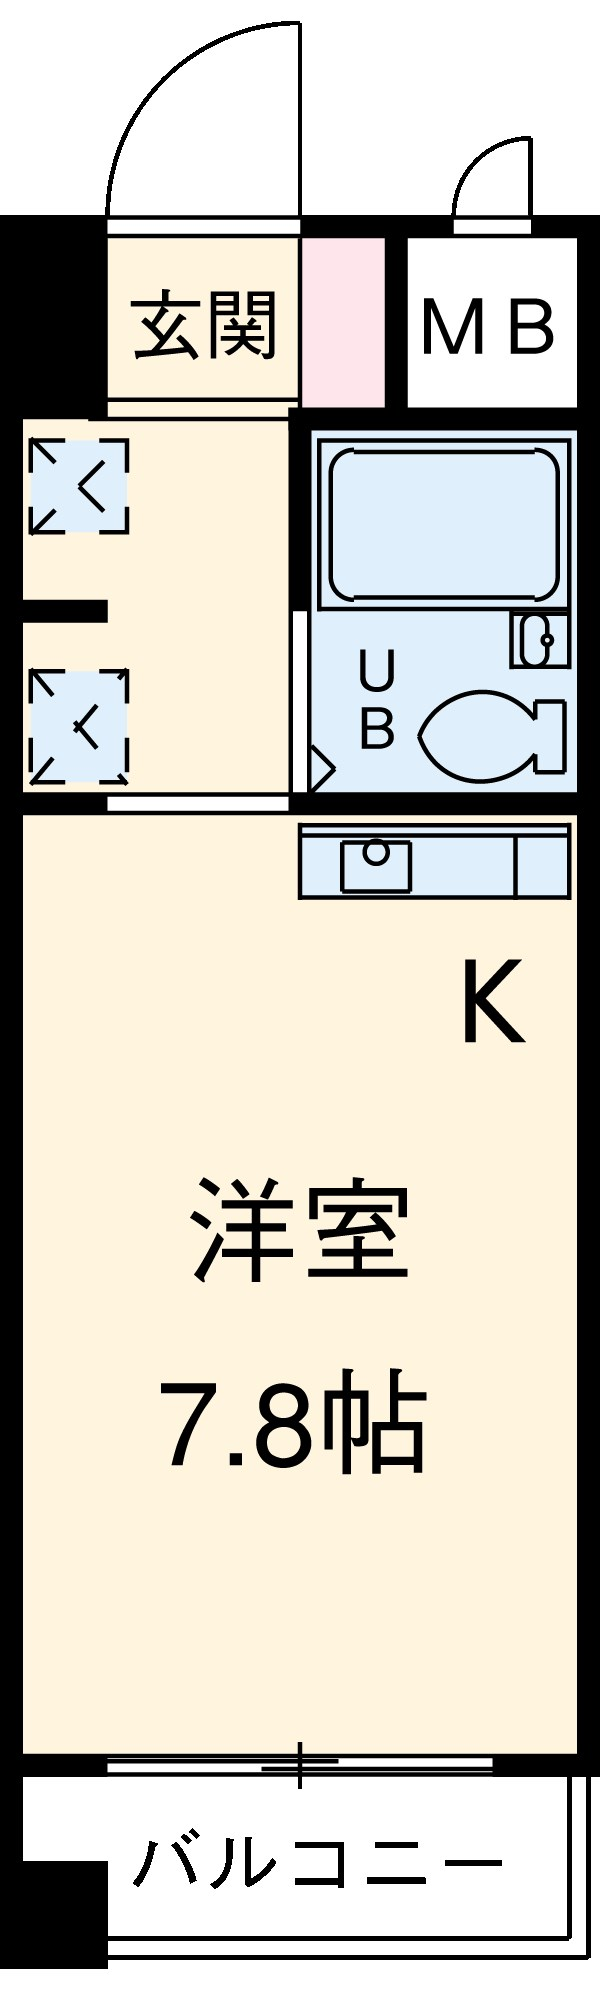 Komodokasa Miwa 301号室の間取り